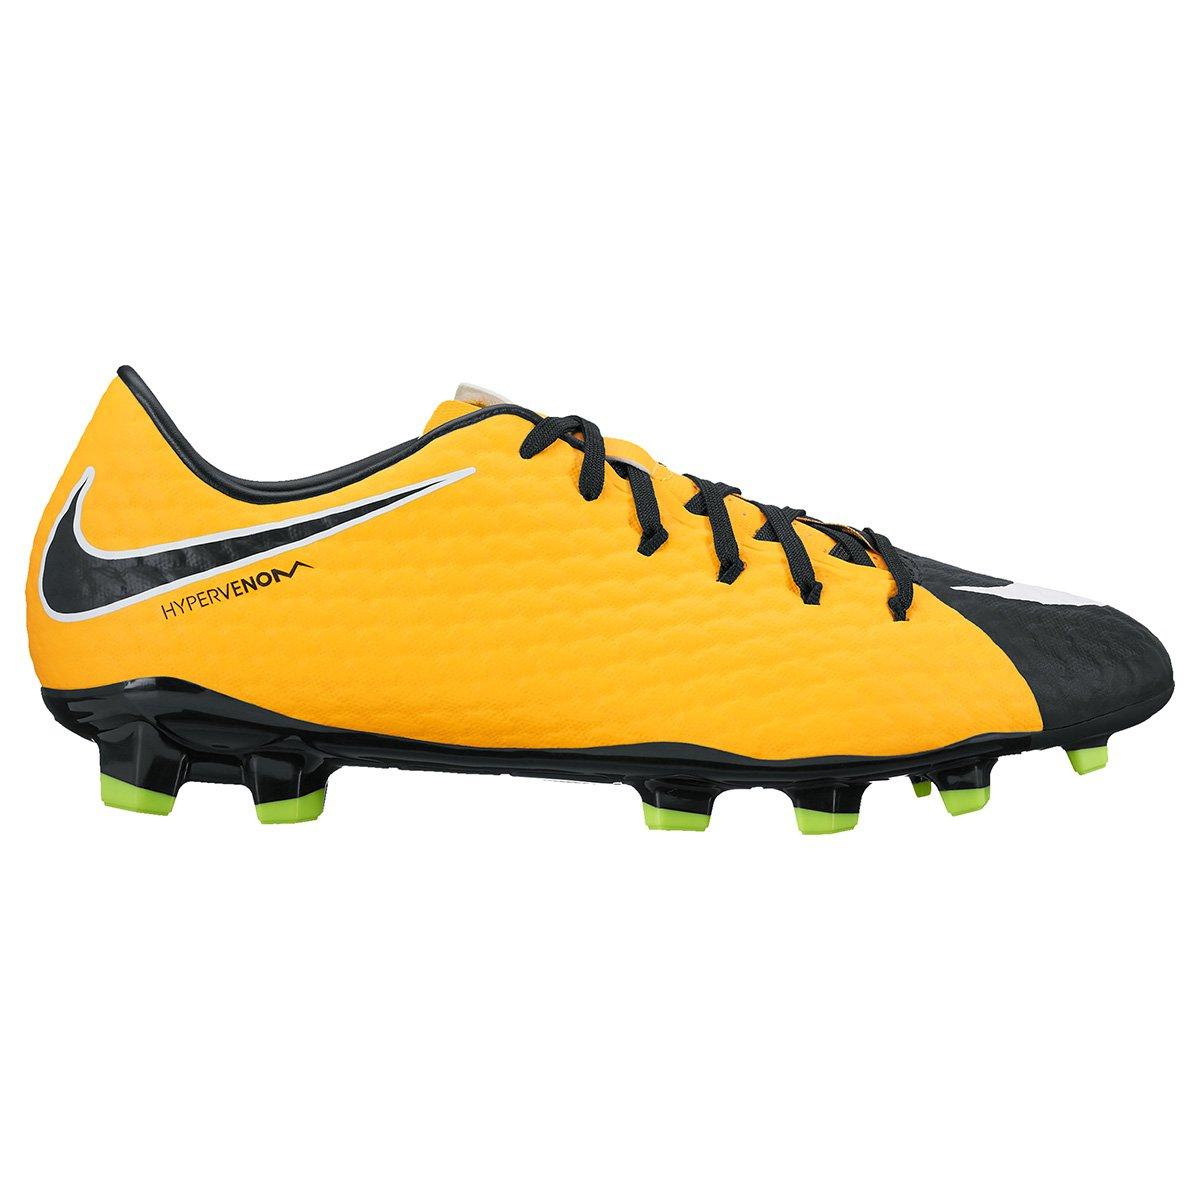 eb6f89ff07 Chuteira Campo Nike Hypervenom Phelon 3 FG - Laranja e Preto ...